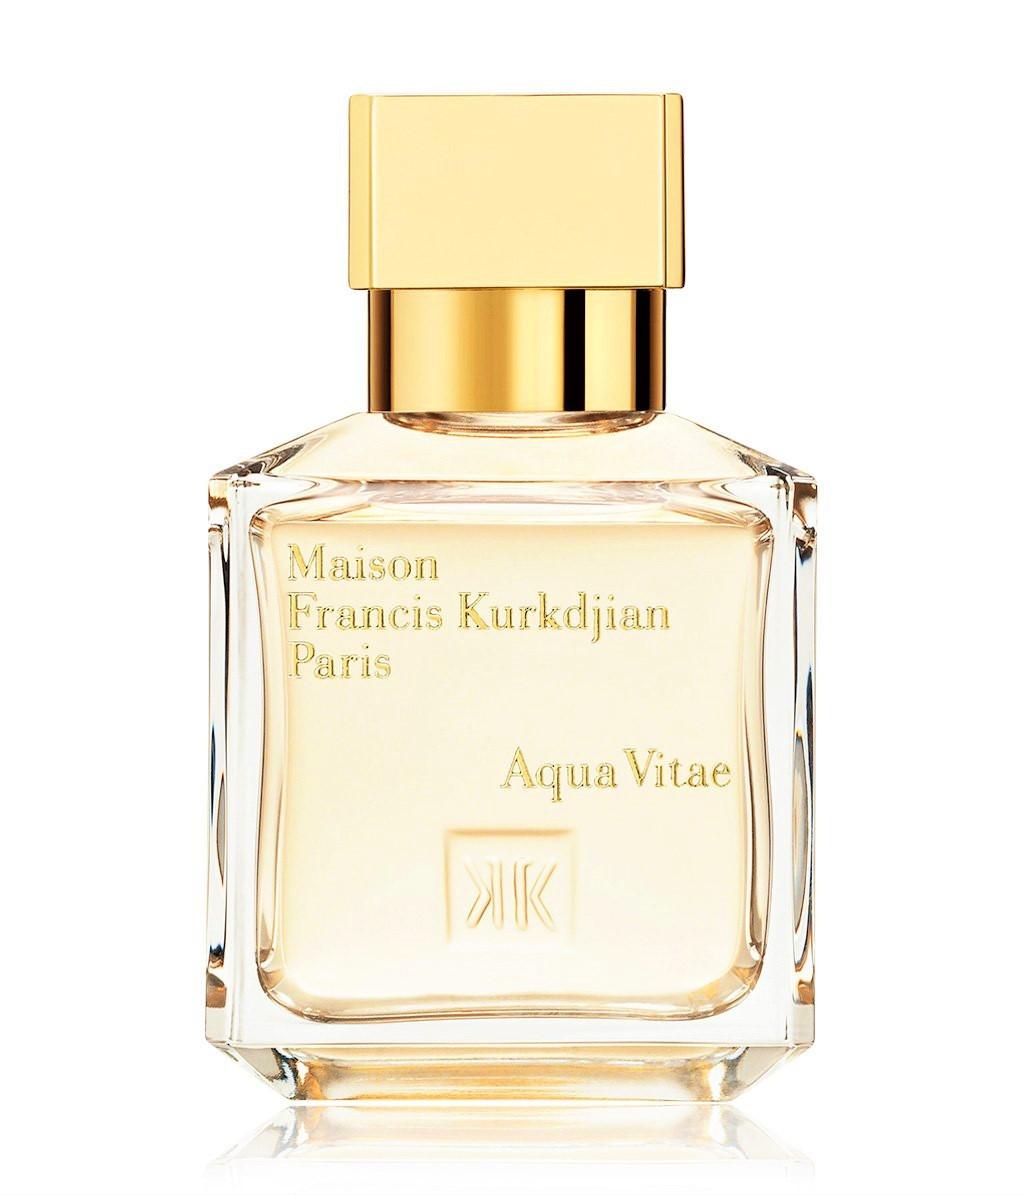 Maison Francis Kurkdjian Aqua Vitae Forte edp 70ml Tester, France